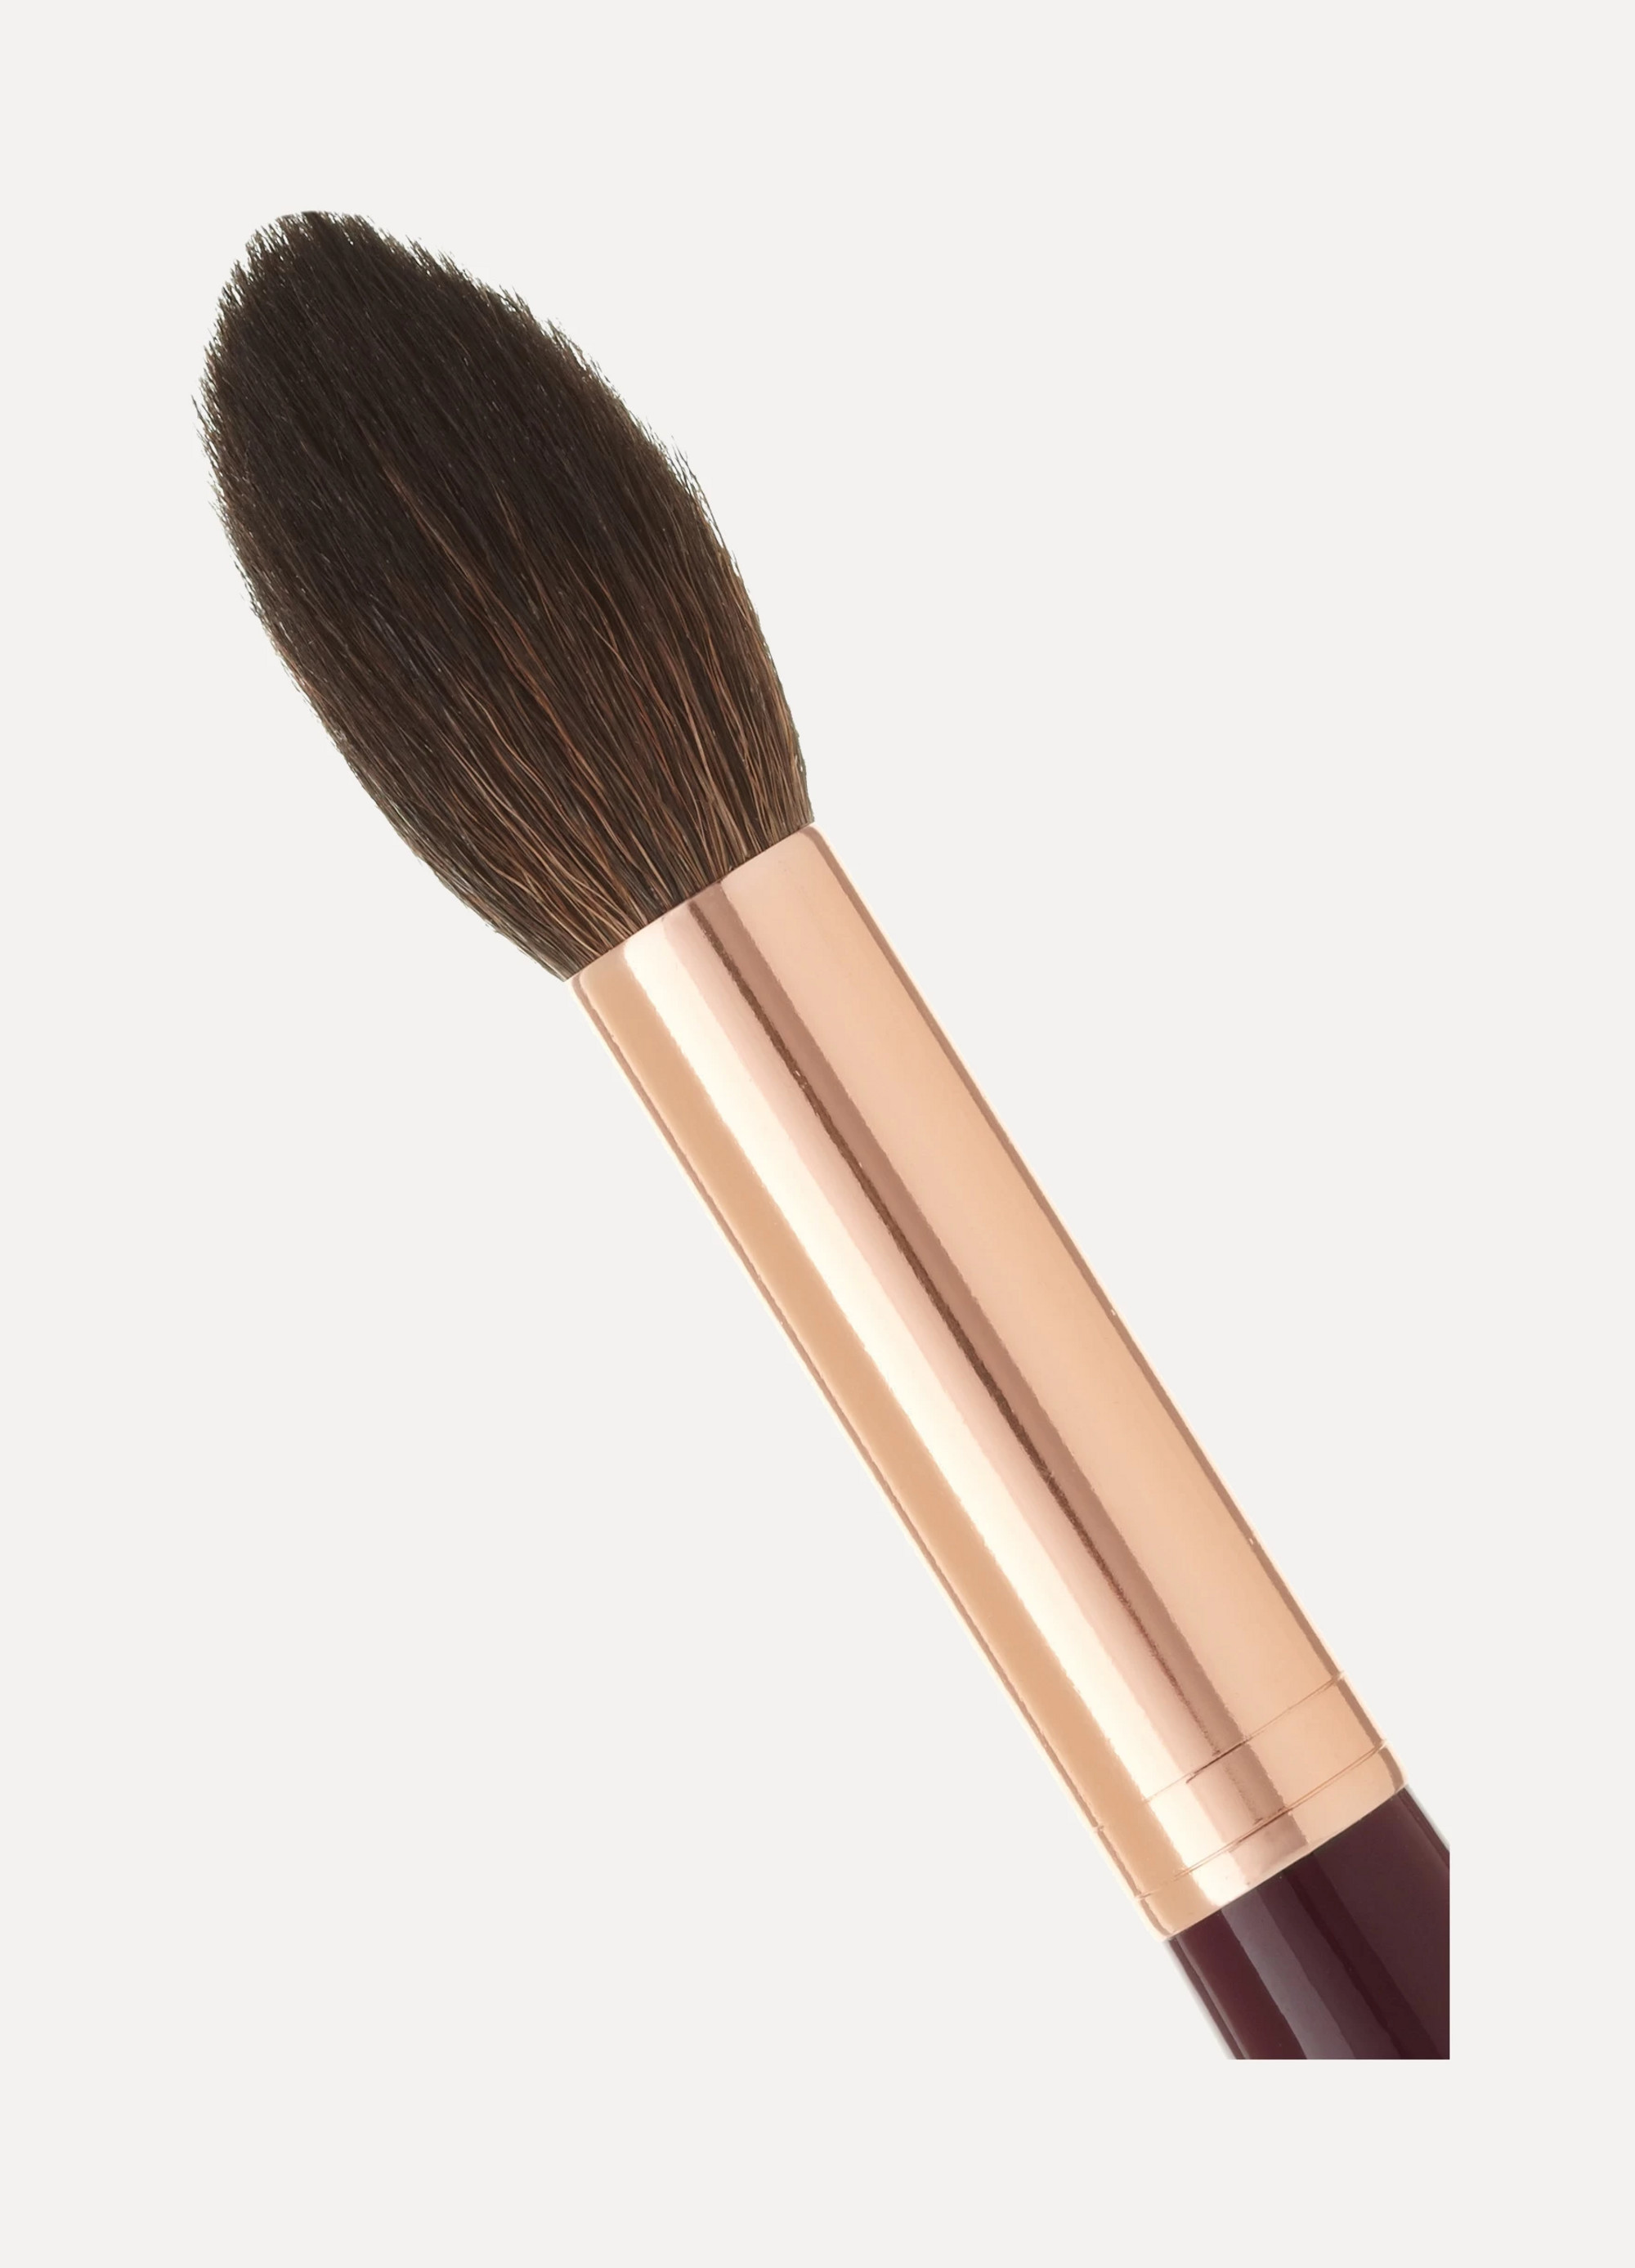 Charlotte Tilbury Powder & Sculpt Brush